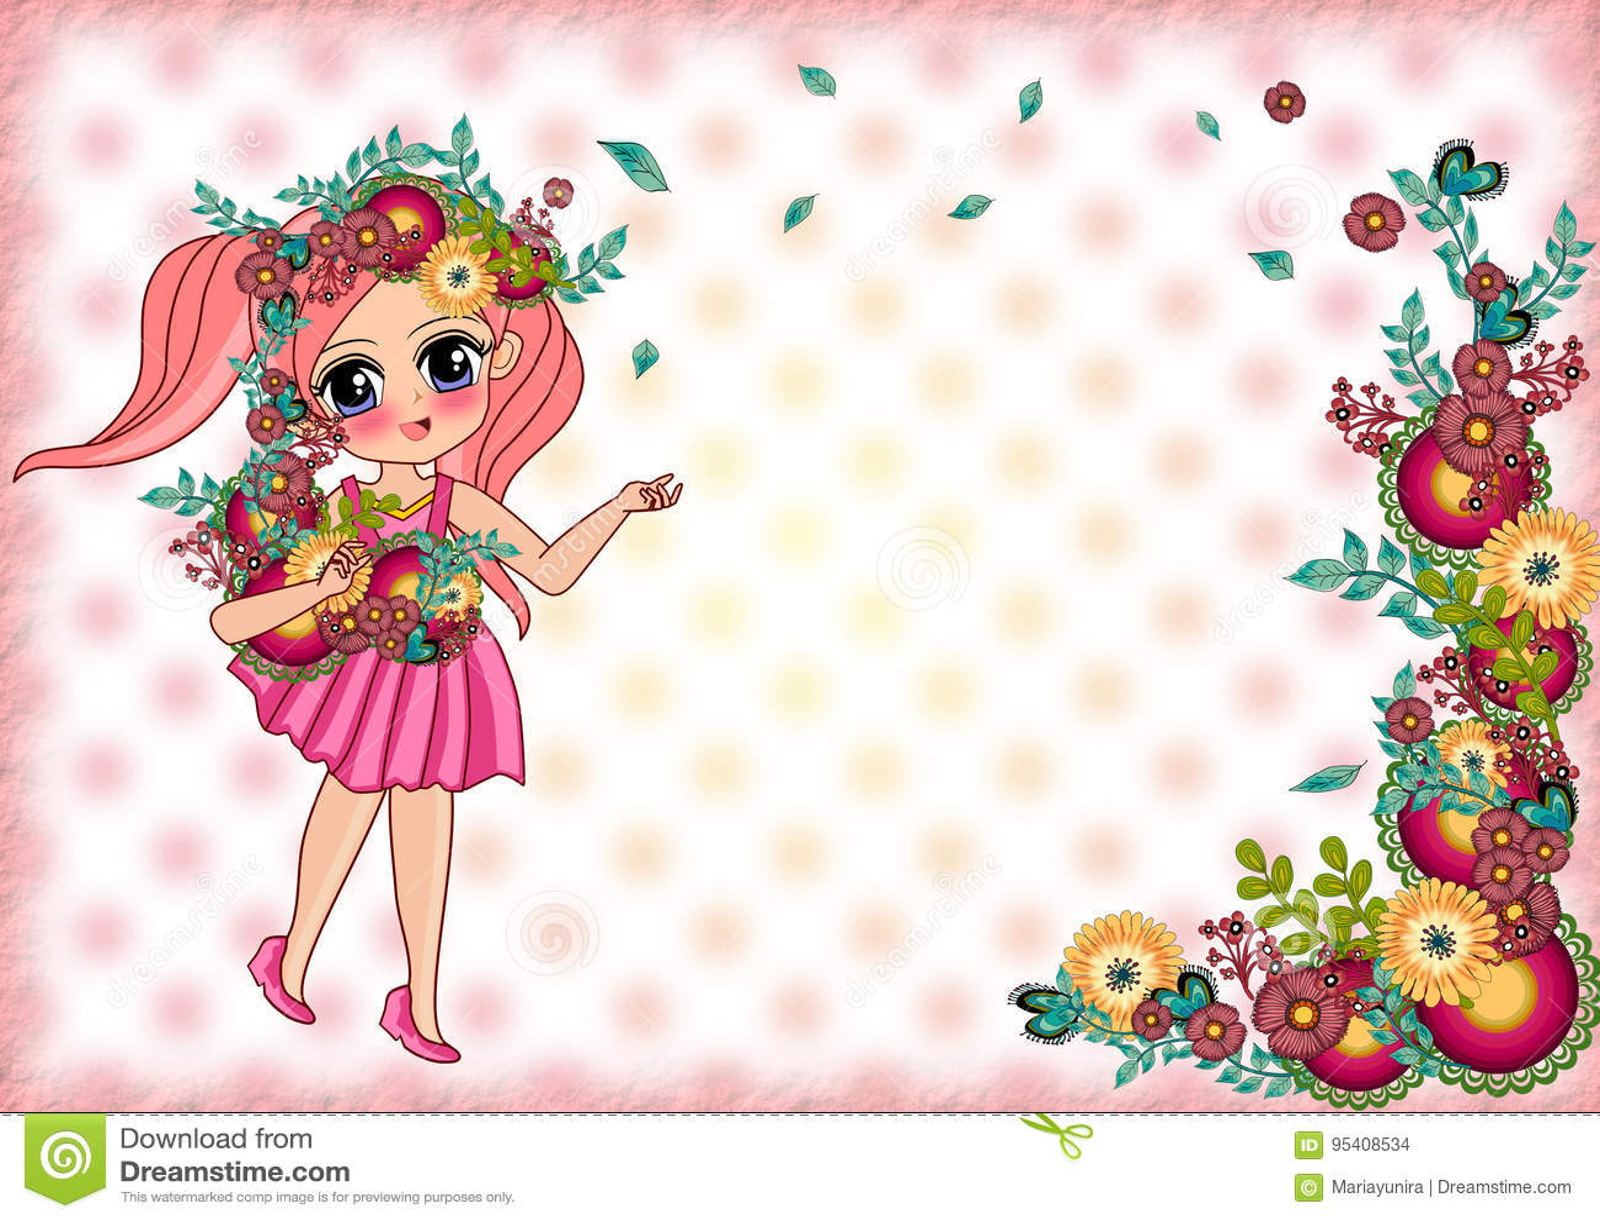 Princess frame stock illustration. Illustration of child - 95408534